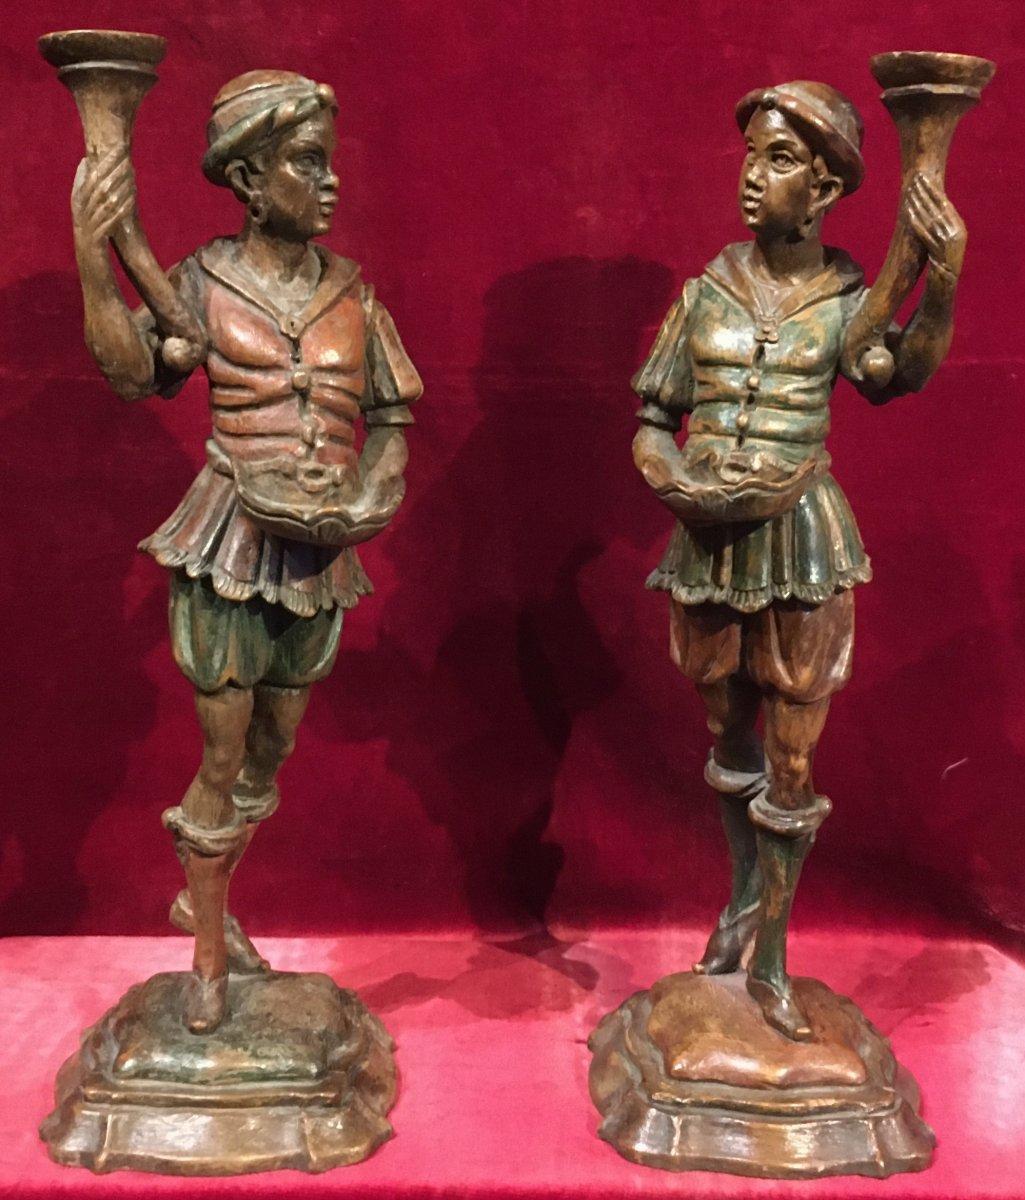 Pair Of Polychrome Wood Sculptures, Numides Torcheres Doors. Venice 19th Century.